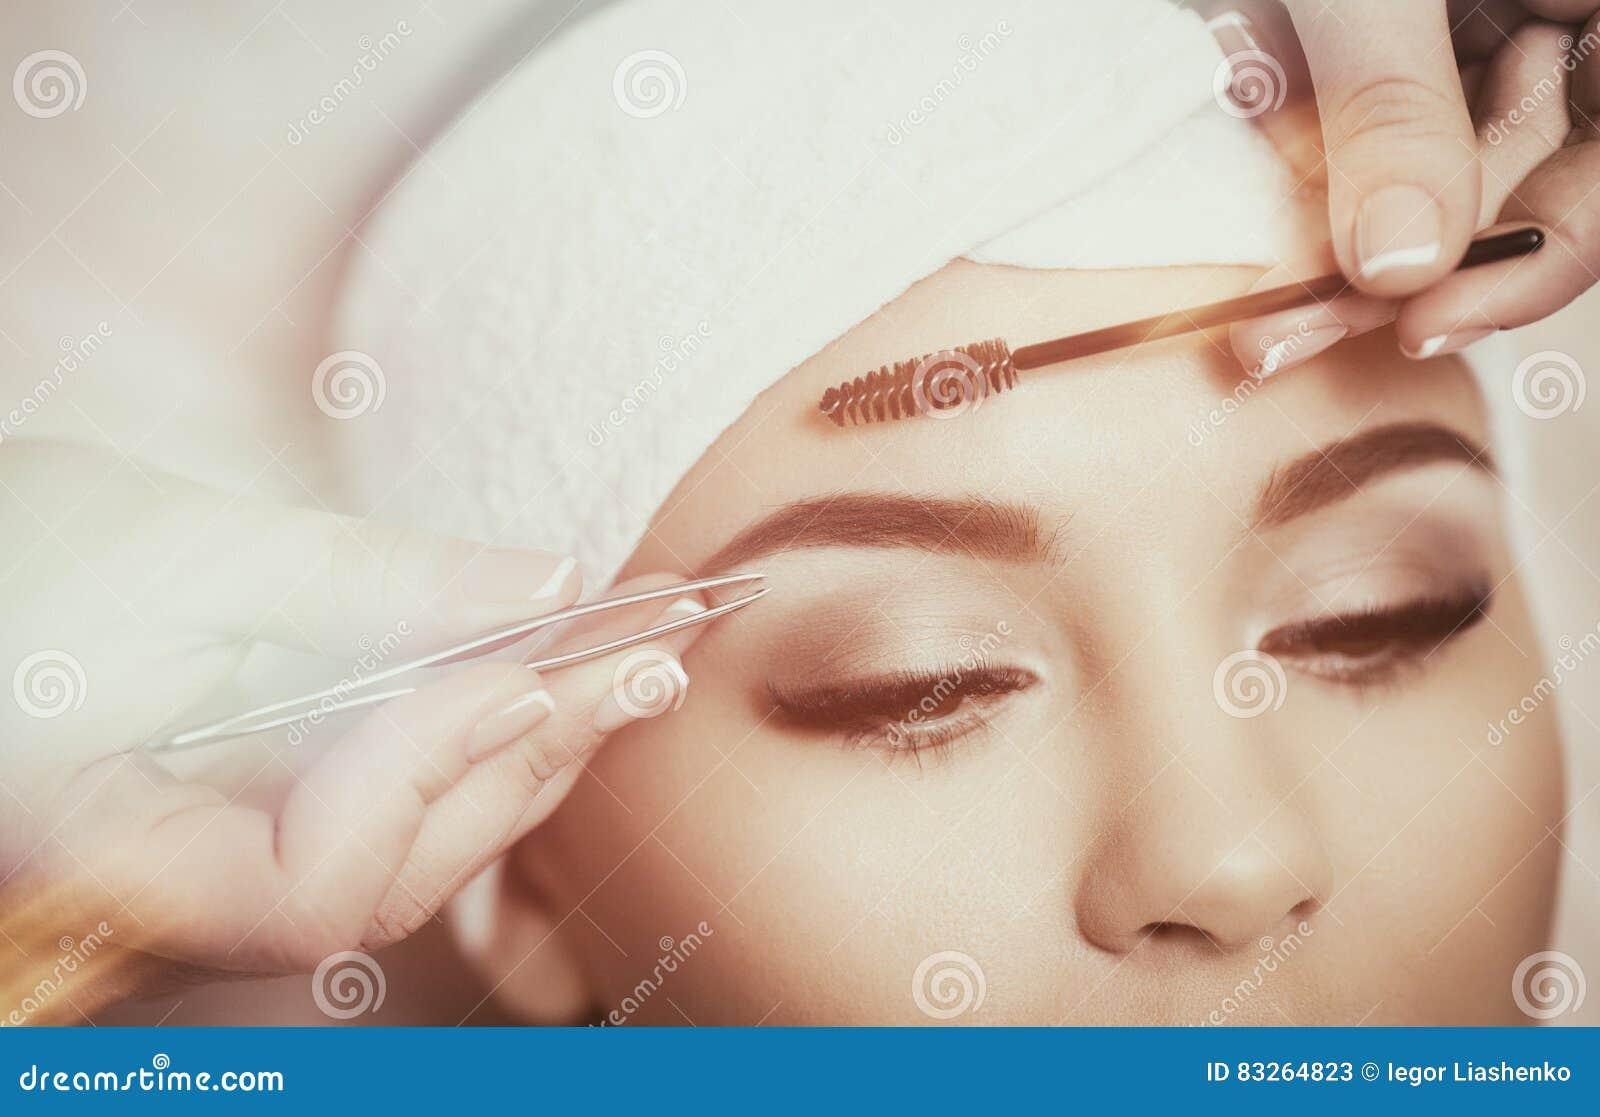 Beautiful Young Woman Gets Eyebrow Correction Procedure Stock Image